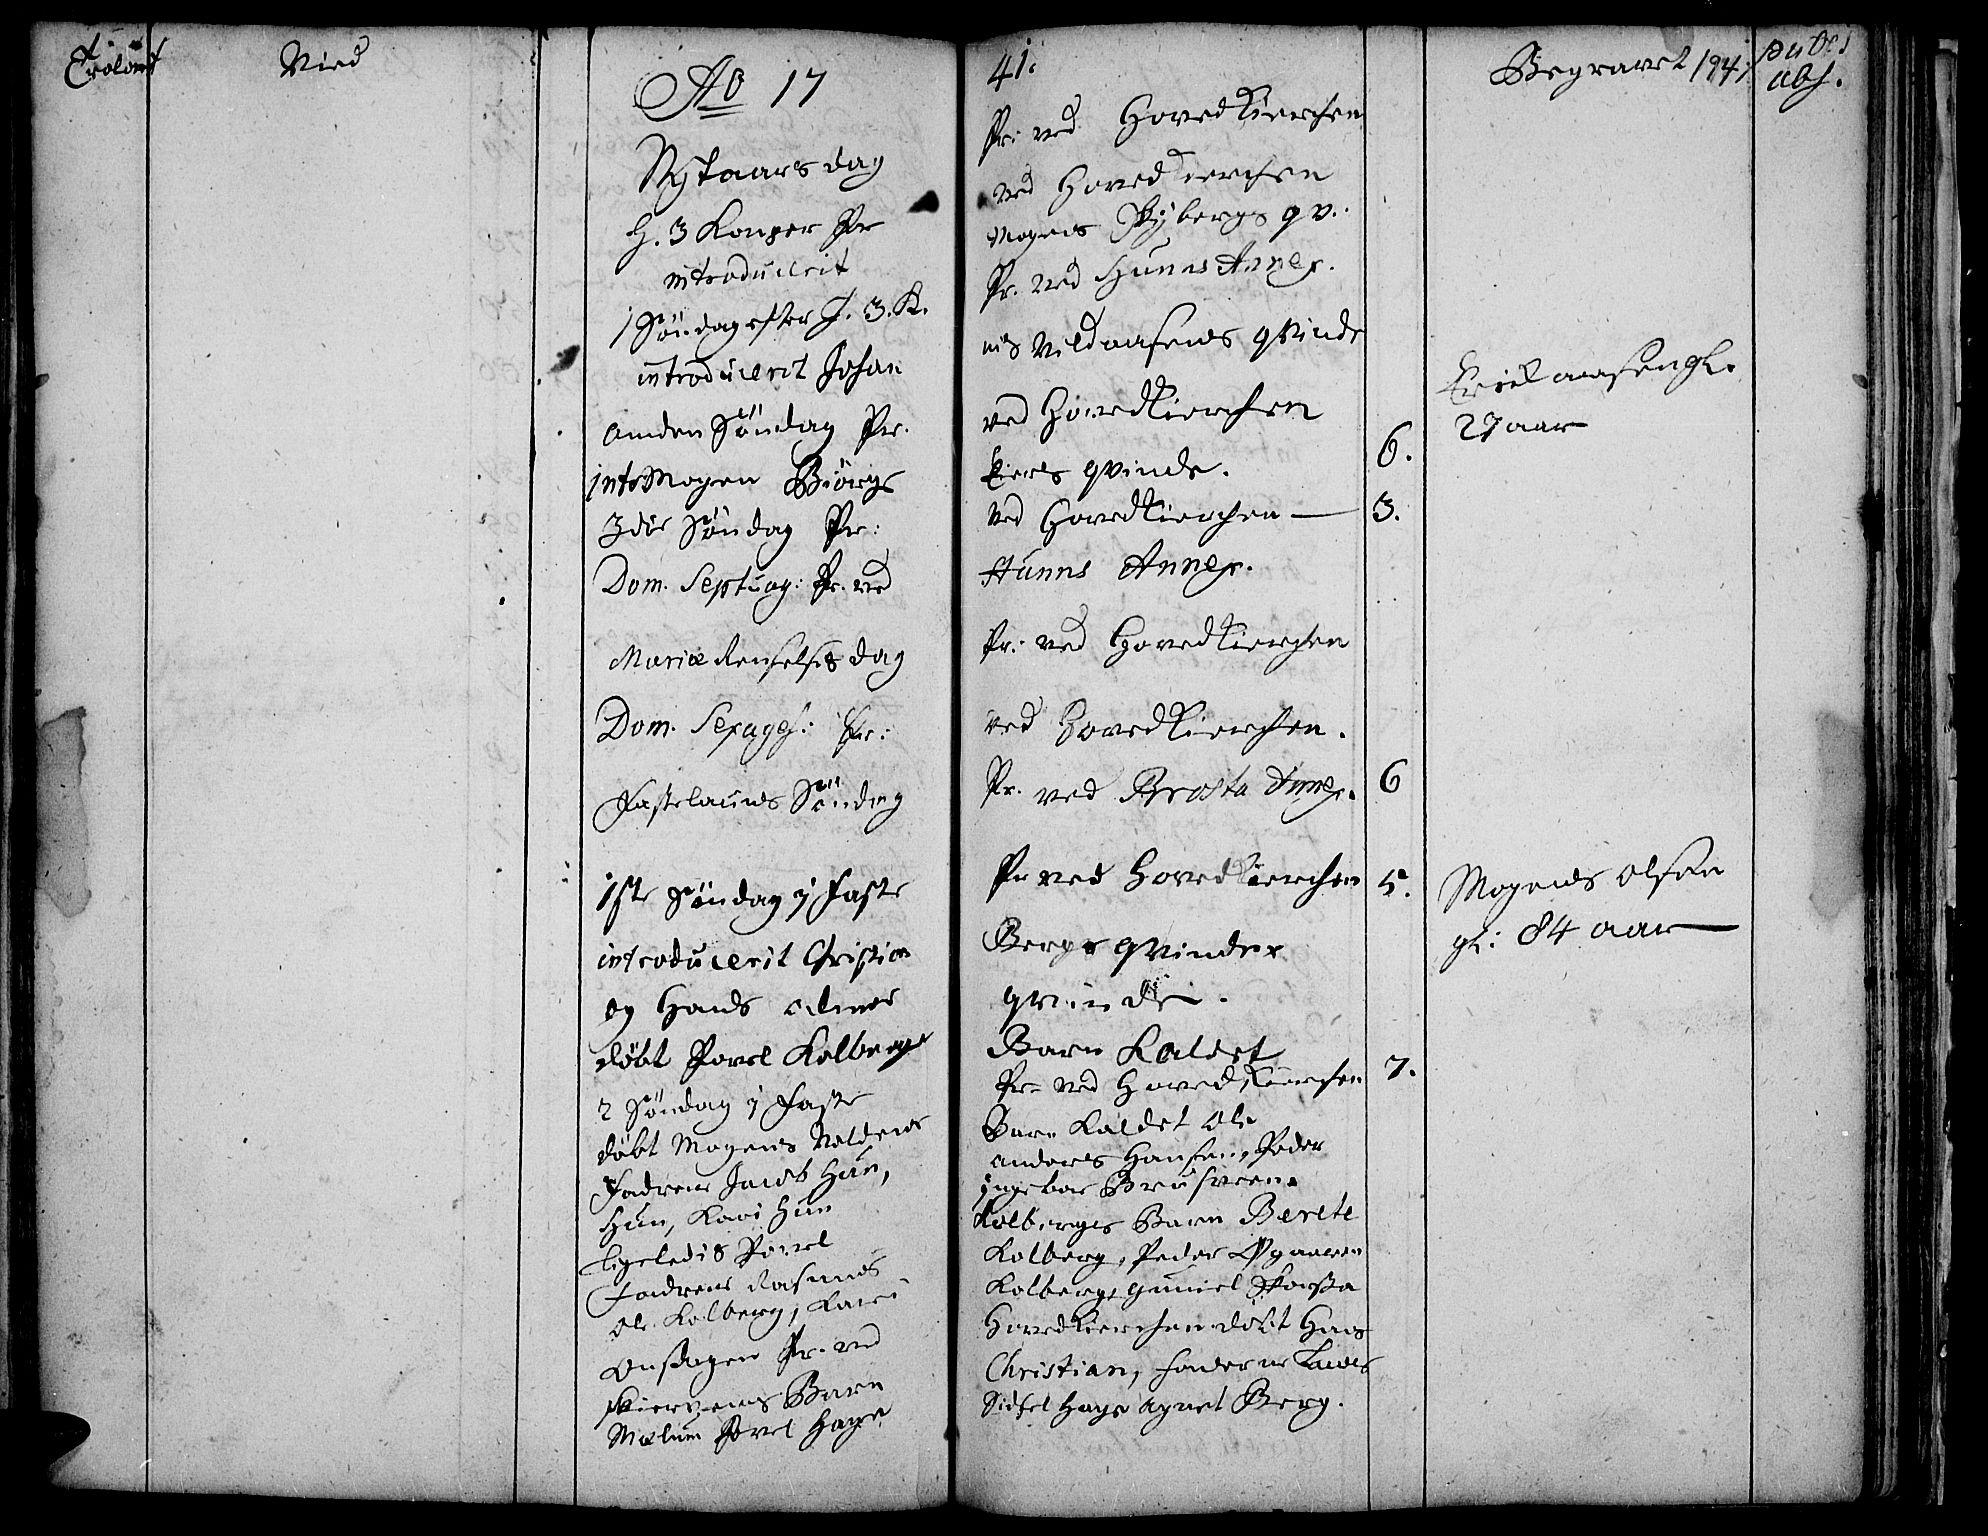 SAH, Vardal prestekontor, H/Ha/Haa/L0001: Ministerialbok nr. 1, 1706-1748, s. 194